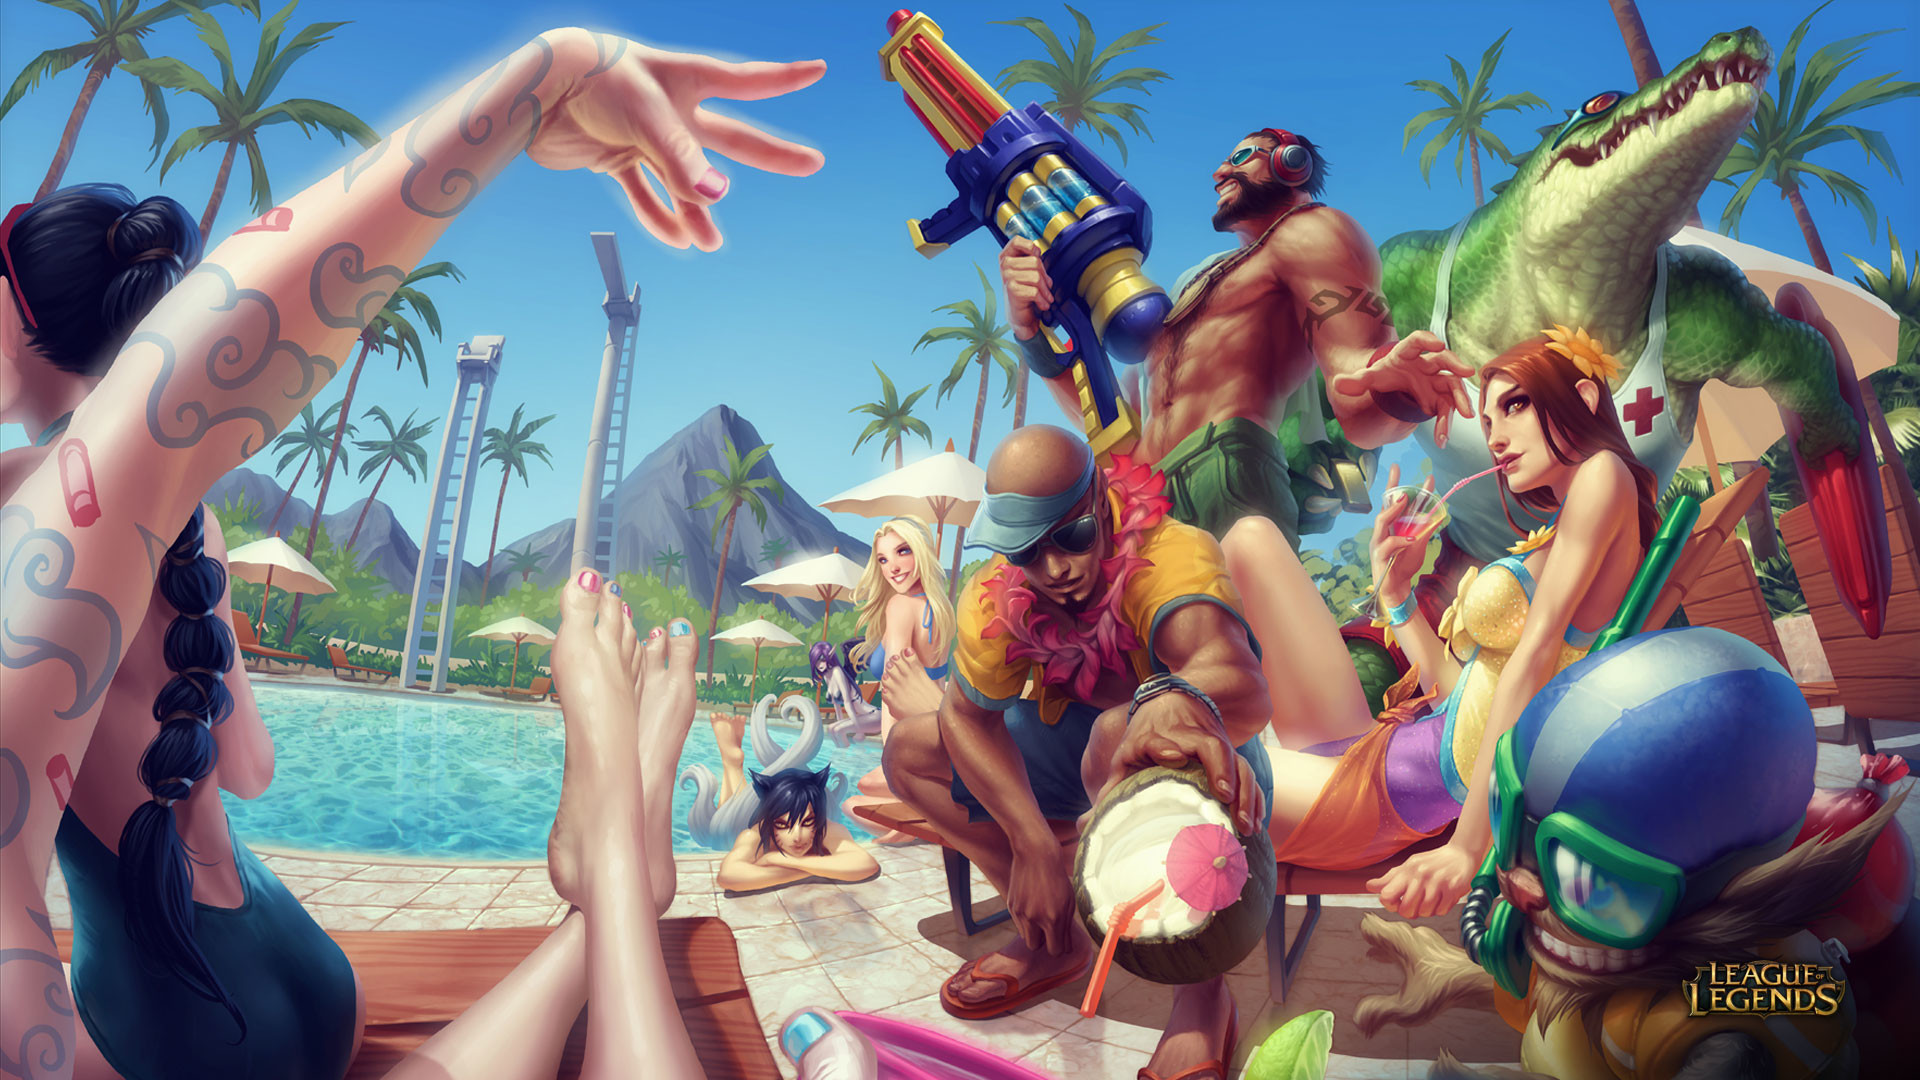 Pool Party · Wallpaper